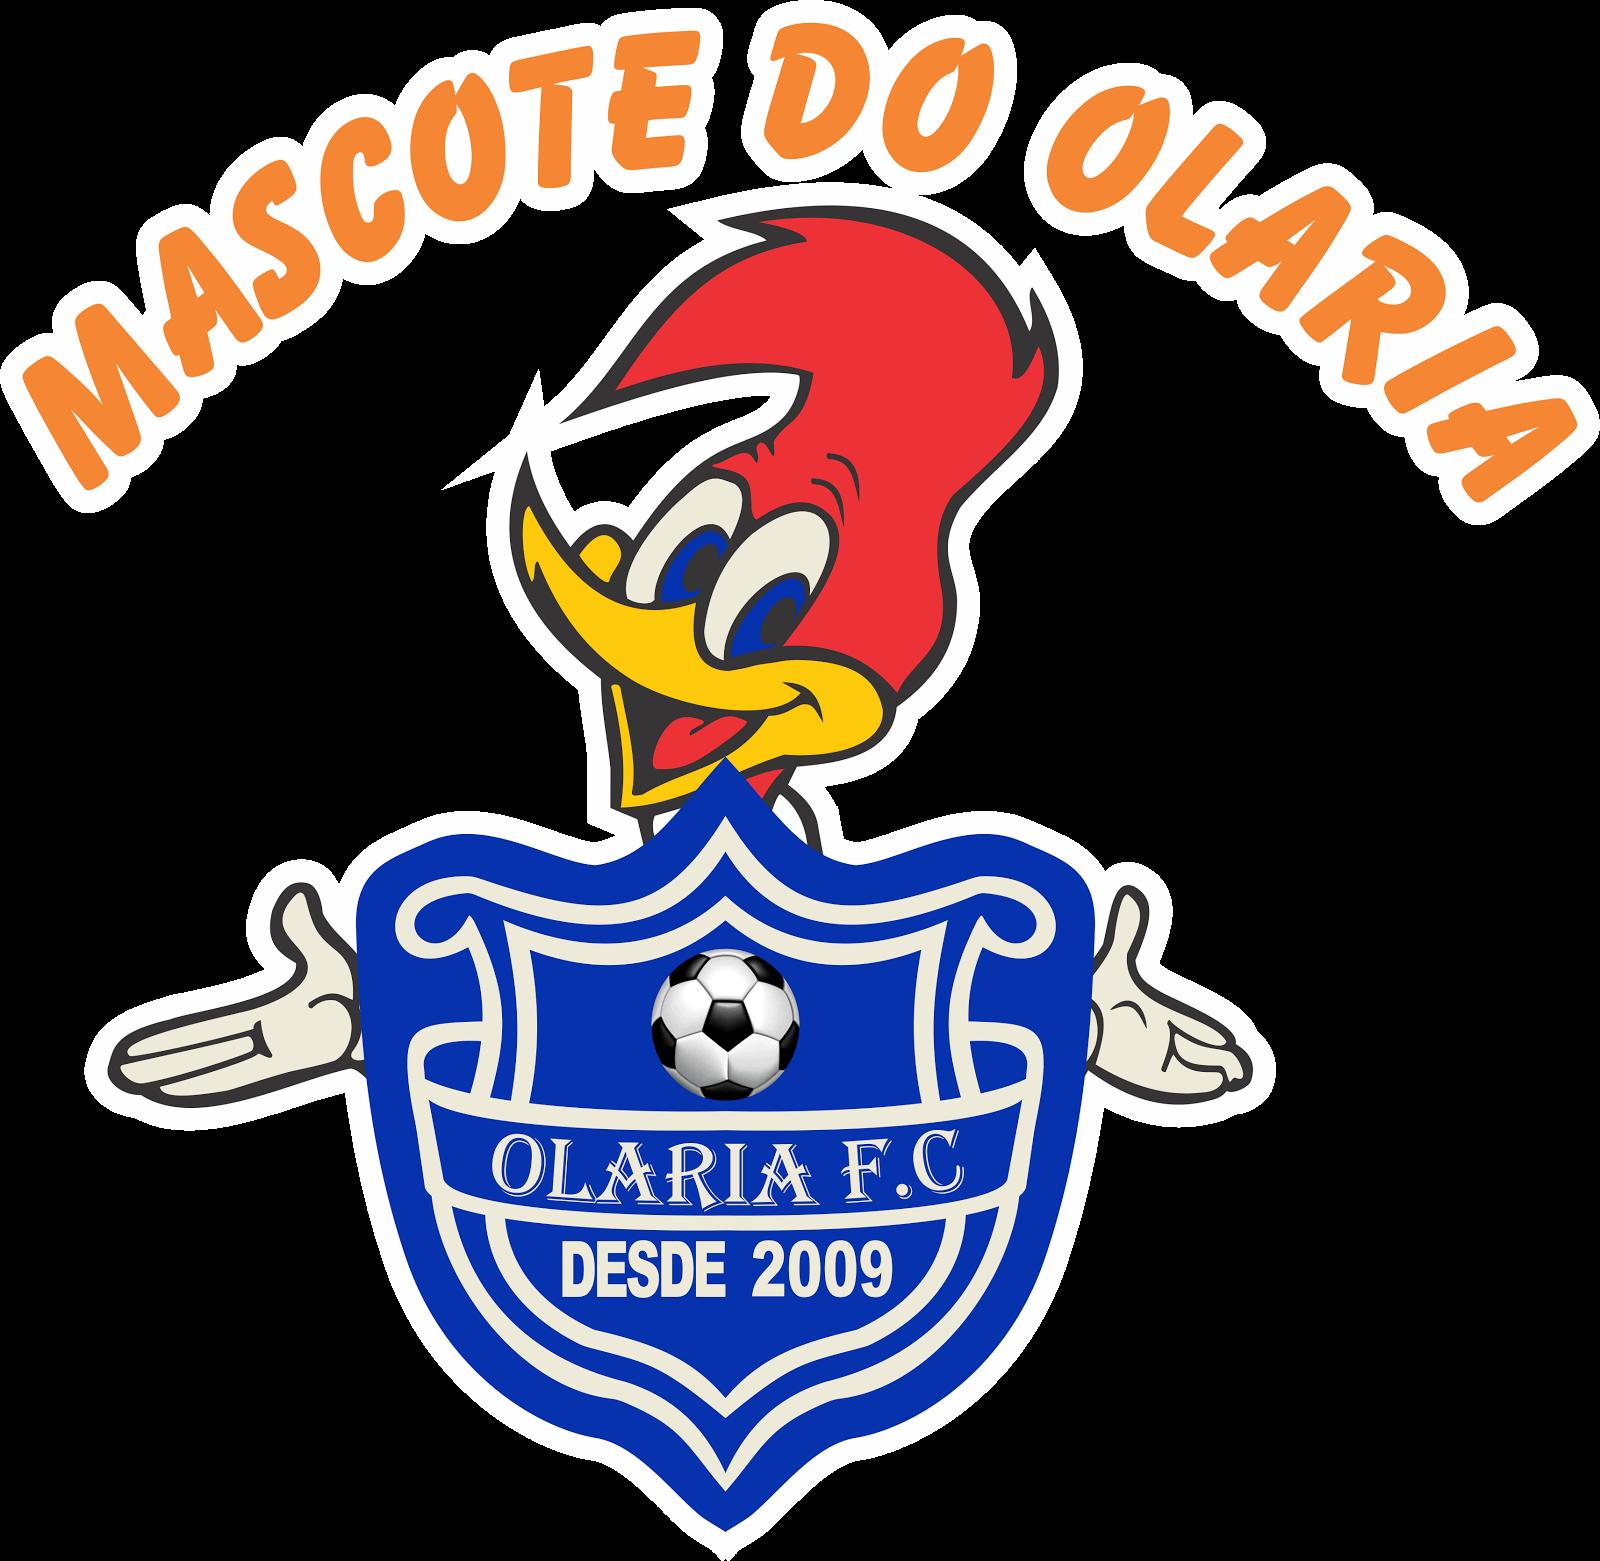 Mascote do Olaria